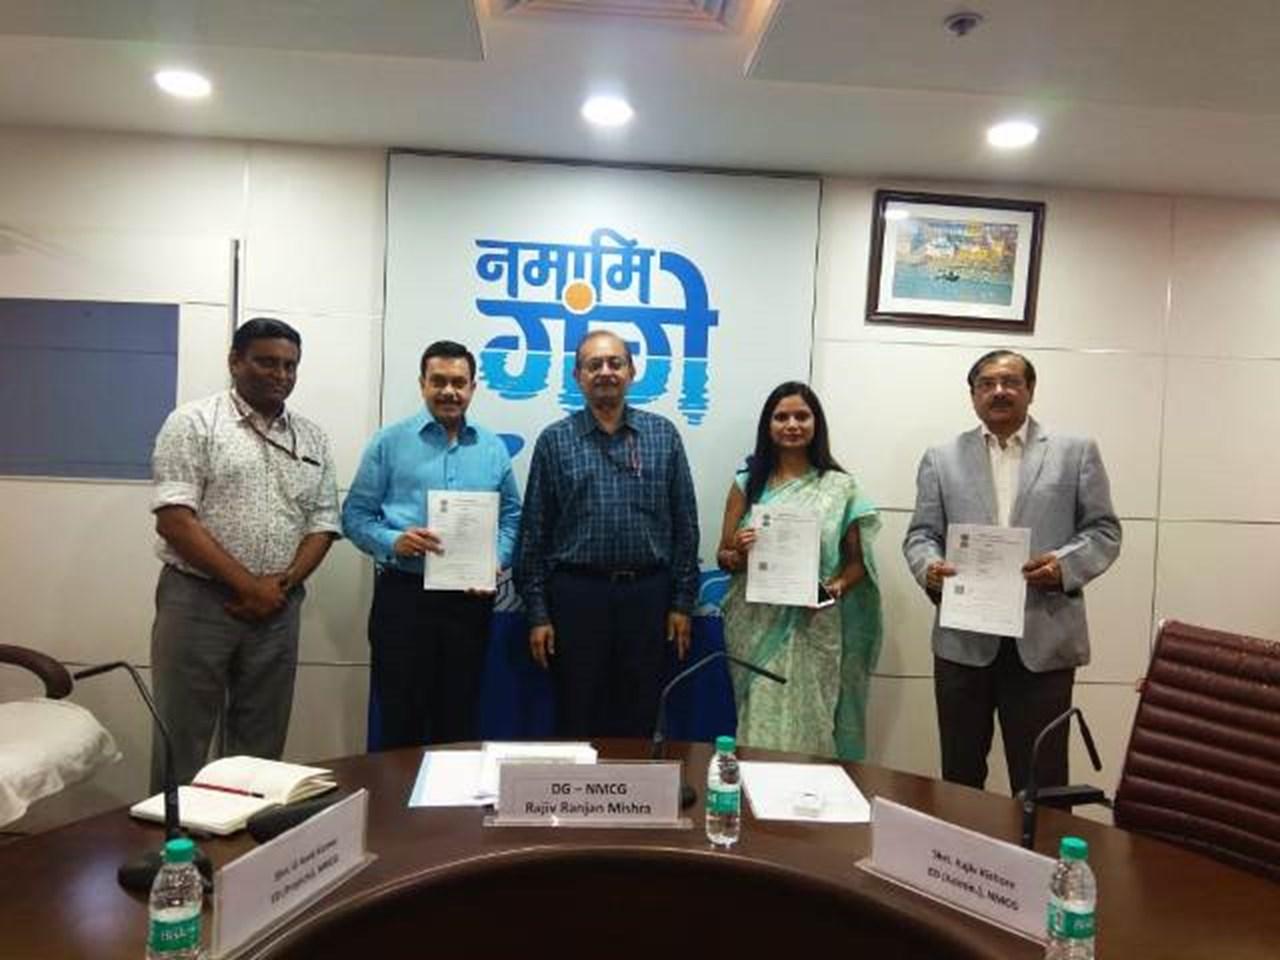 NMGC approves new projects for rejuvenation of 6 rivers in Uttarakhand| ഉത്തരാഖണ്ഡിലെ 6 നദികളുടെ പുനരുജ്ജീവനത്തിനായുള്ള പുതിയ പദ്ധതികൾക്ക് NMGC അംഗീകാരം നൽകി_40.1